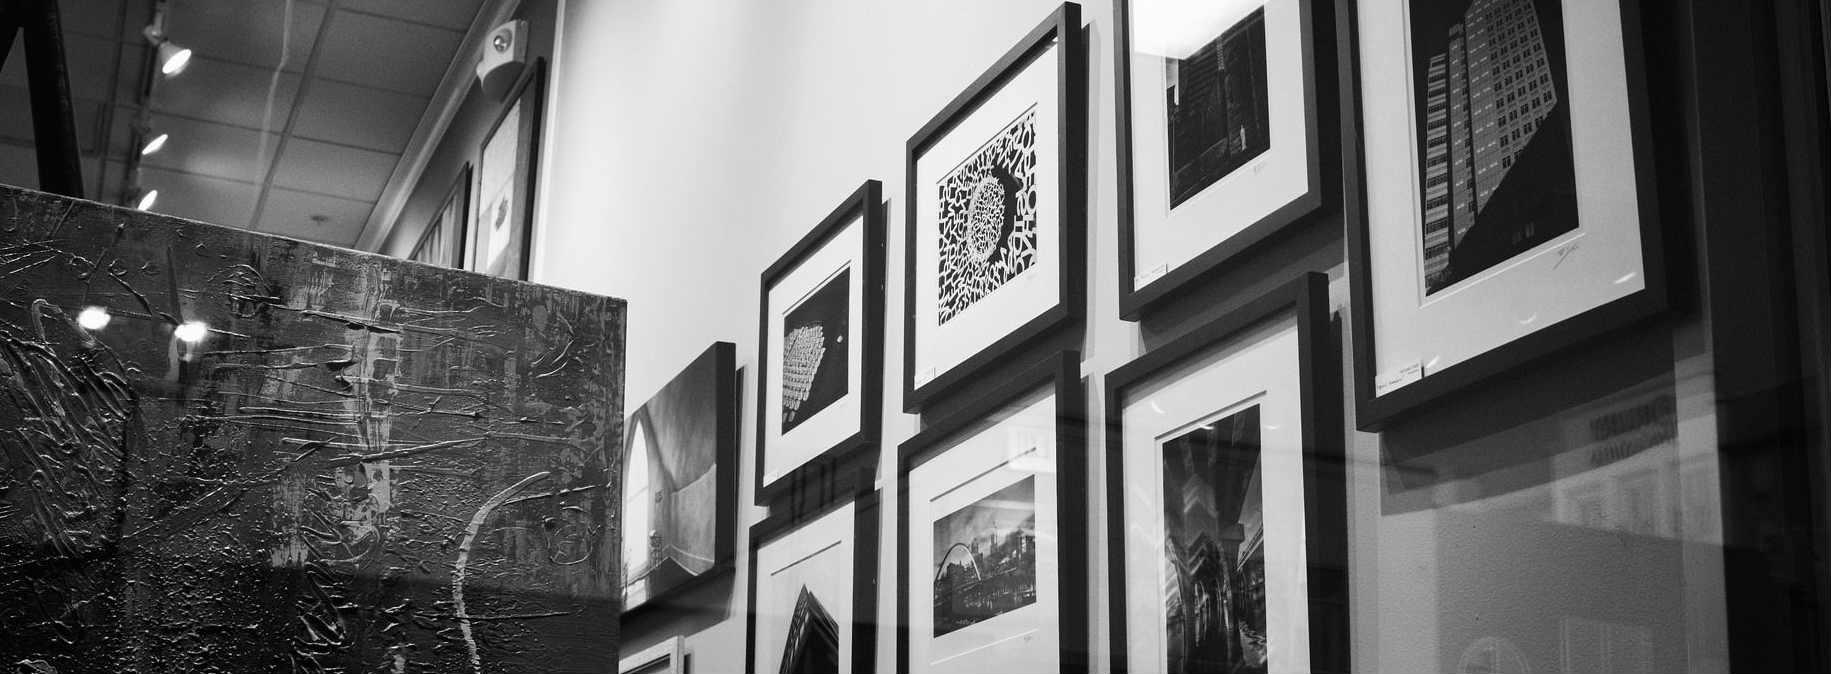 Farah Gallery